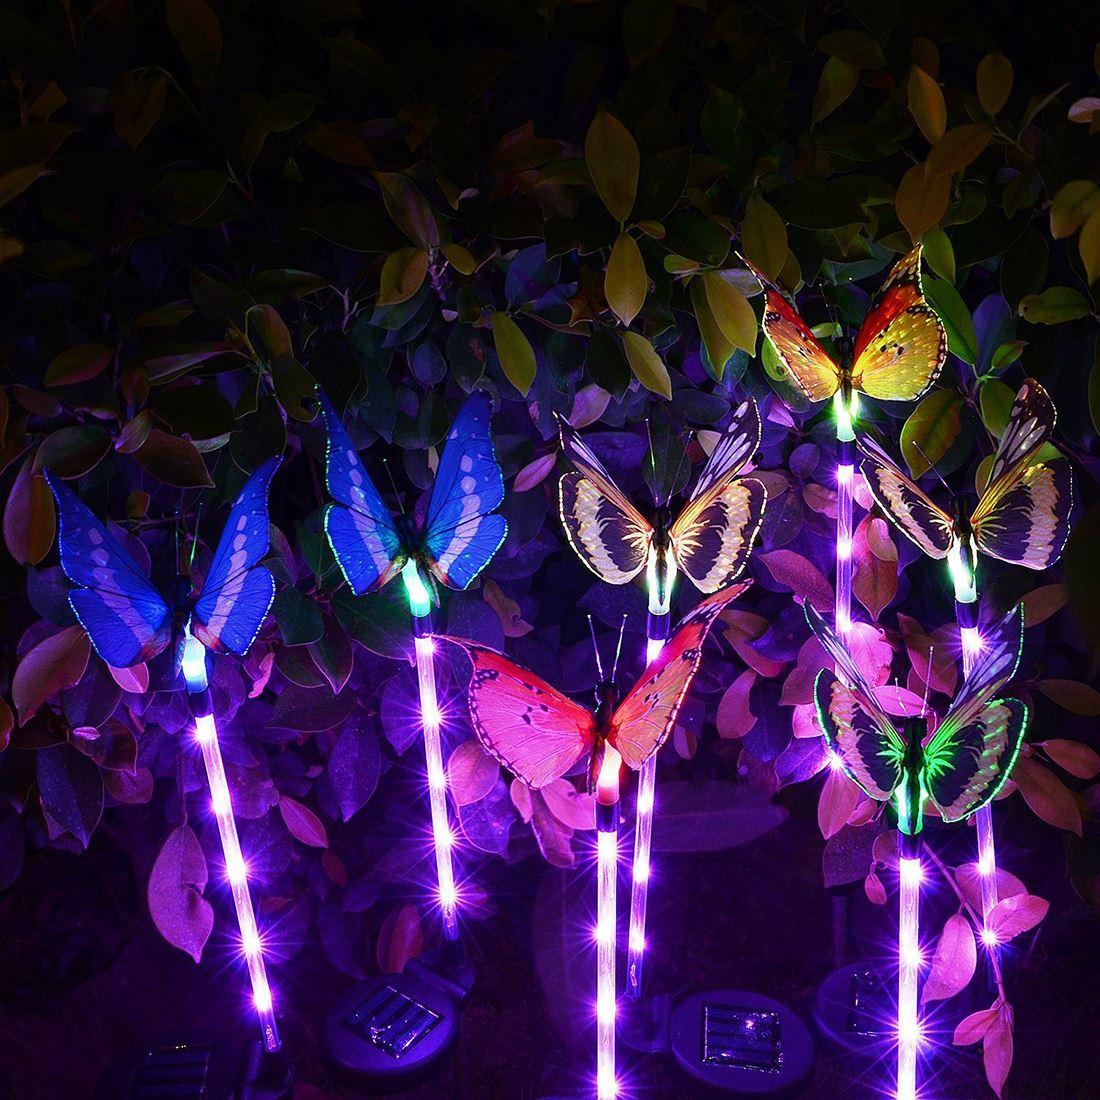 3 pces 60cm multi-cor mudando luzes de borboleta led de fibra óptica borboleta luzes decorativas luzes solares